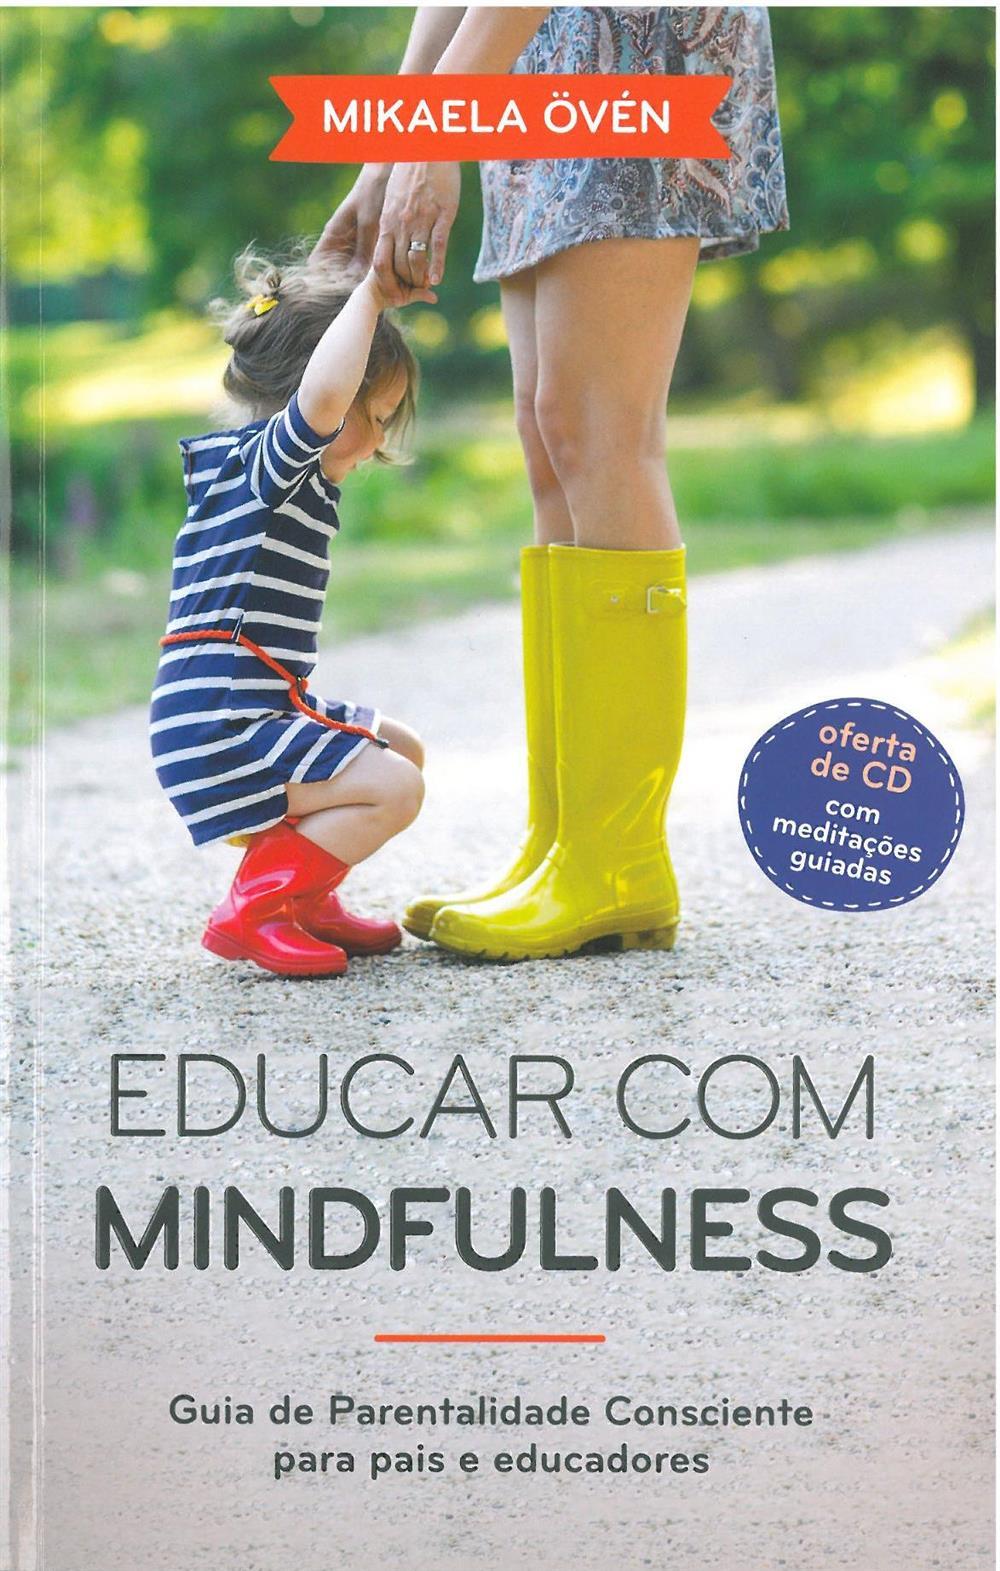 Educar com mindfulness_.jpg